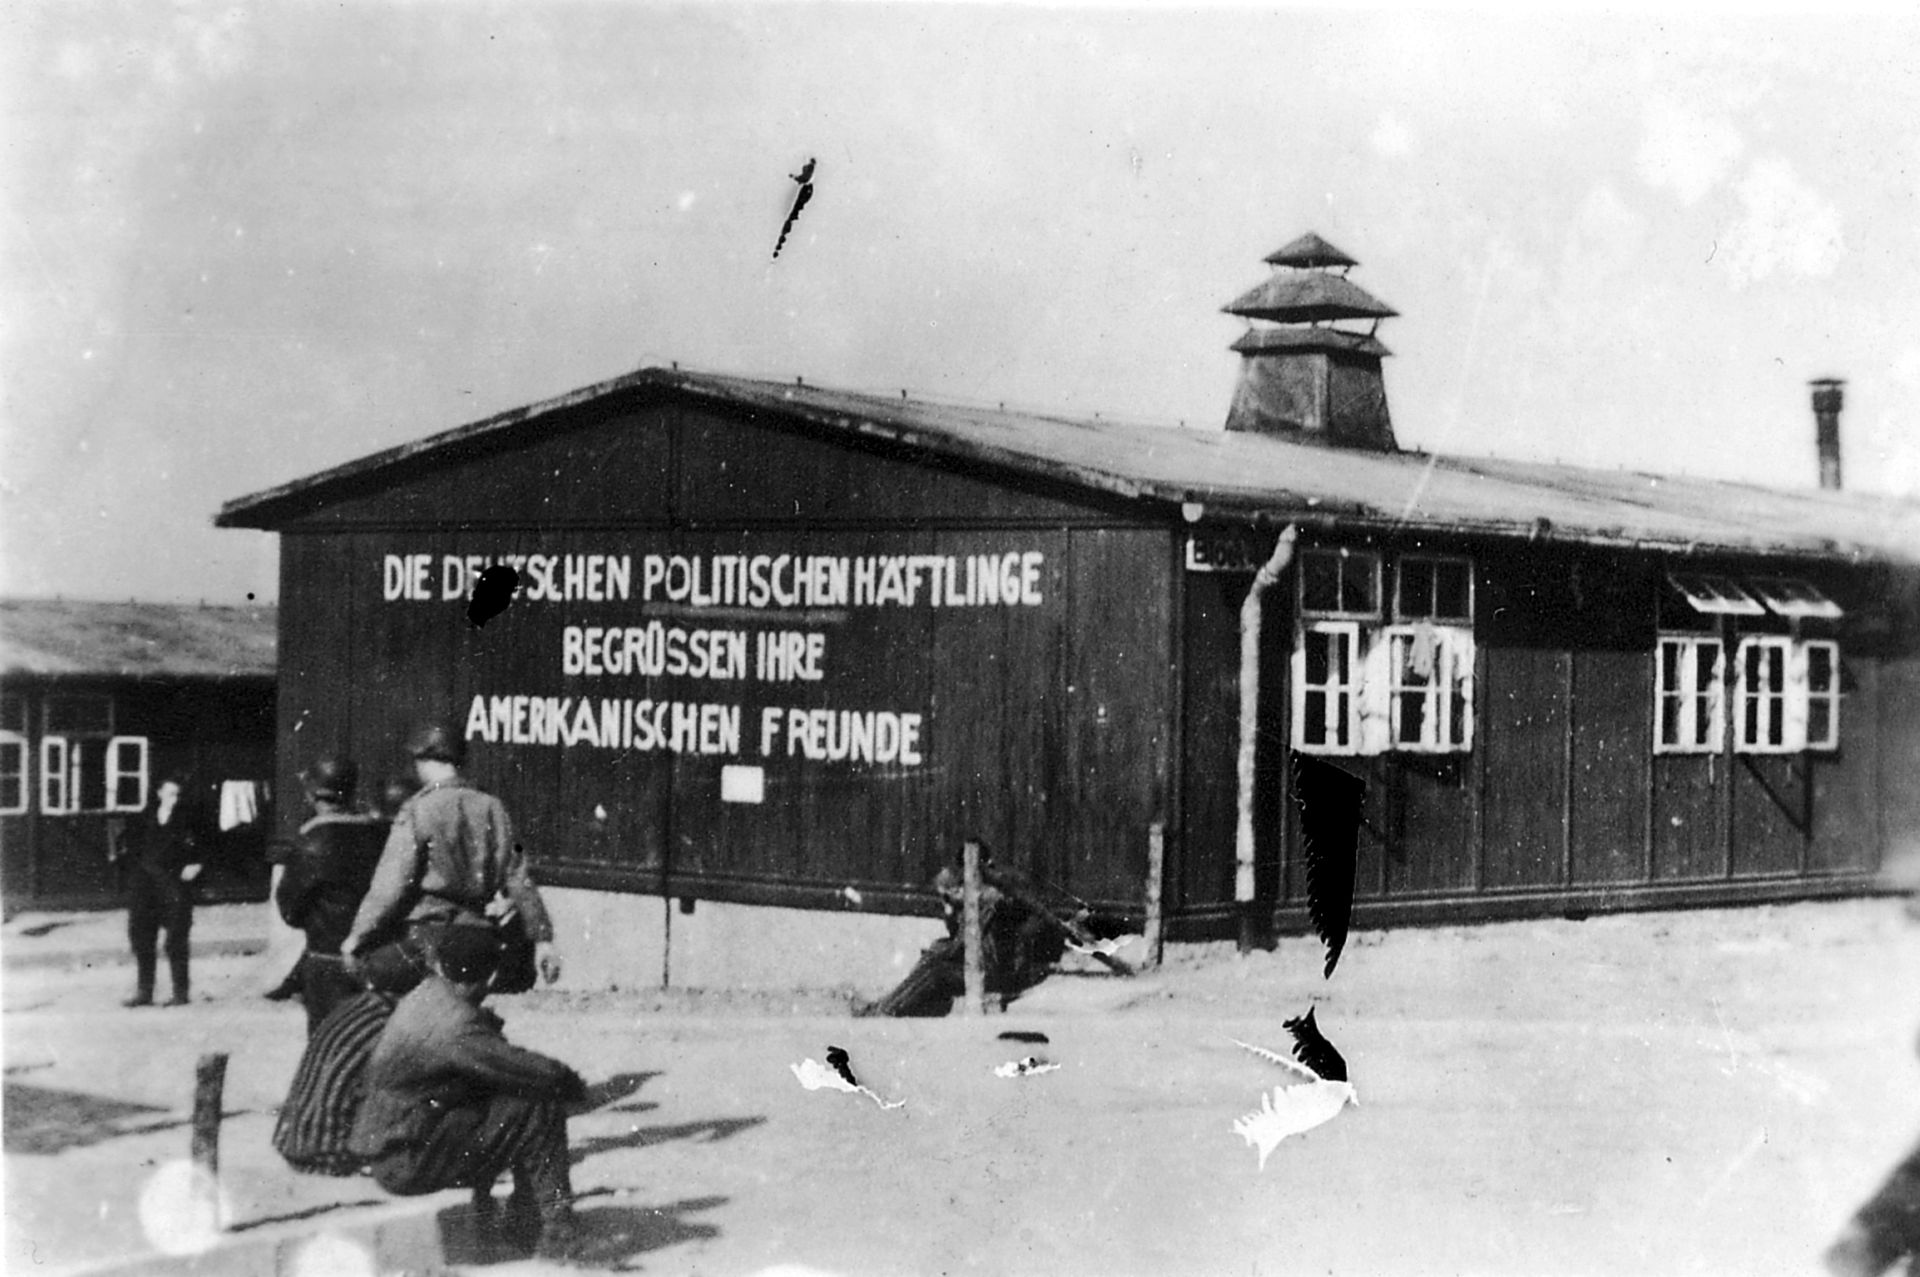 https://upload.wikimedia.org/wikipedia/commons/thumb/9/9b/Buchenwald-J-Rouard-01.jpg/1920px-Buchenwald-J-Rouard-01.jpg